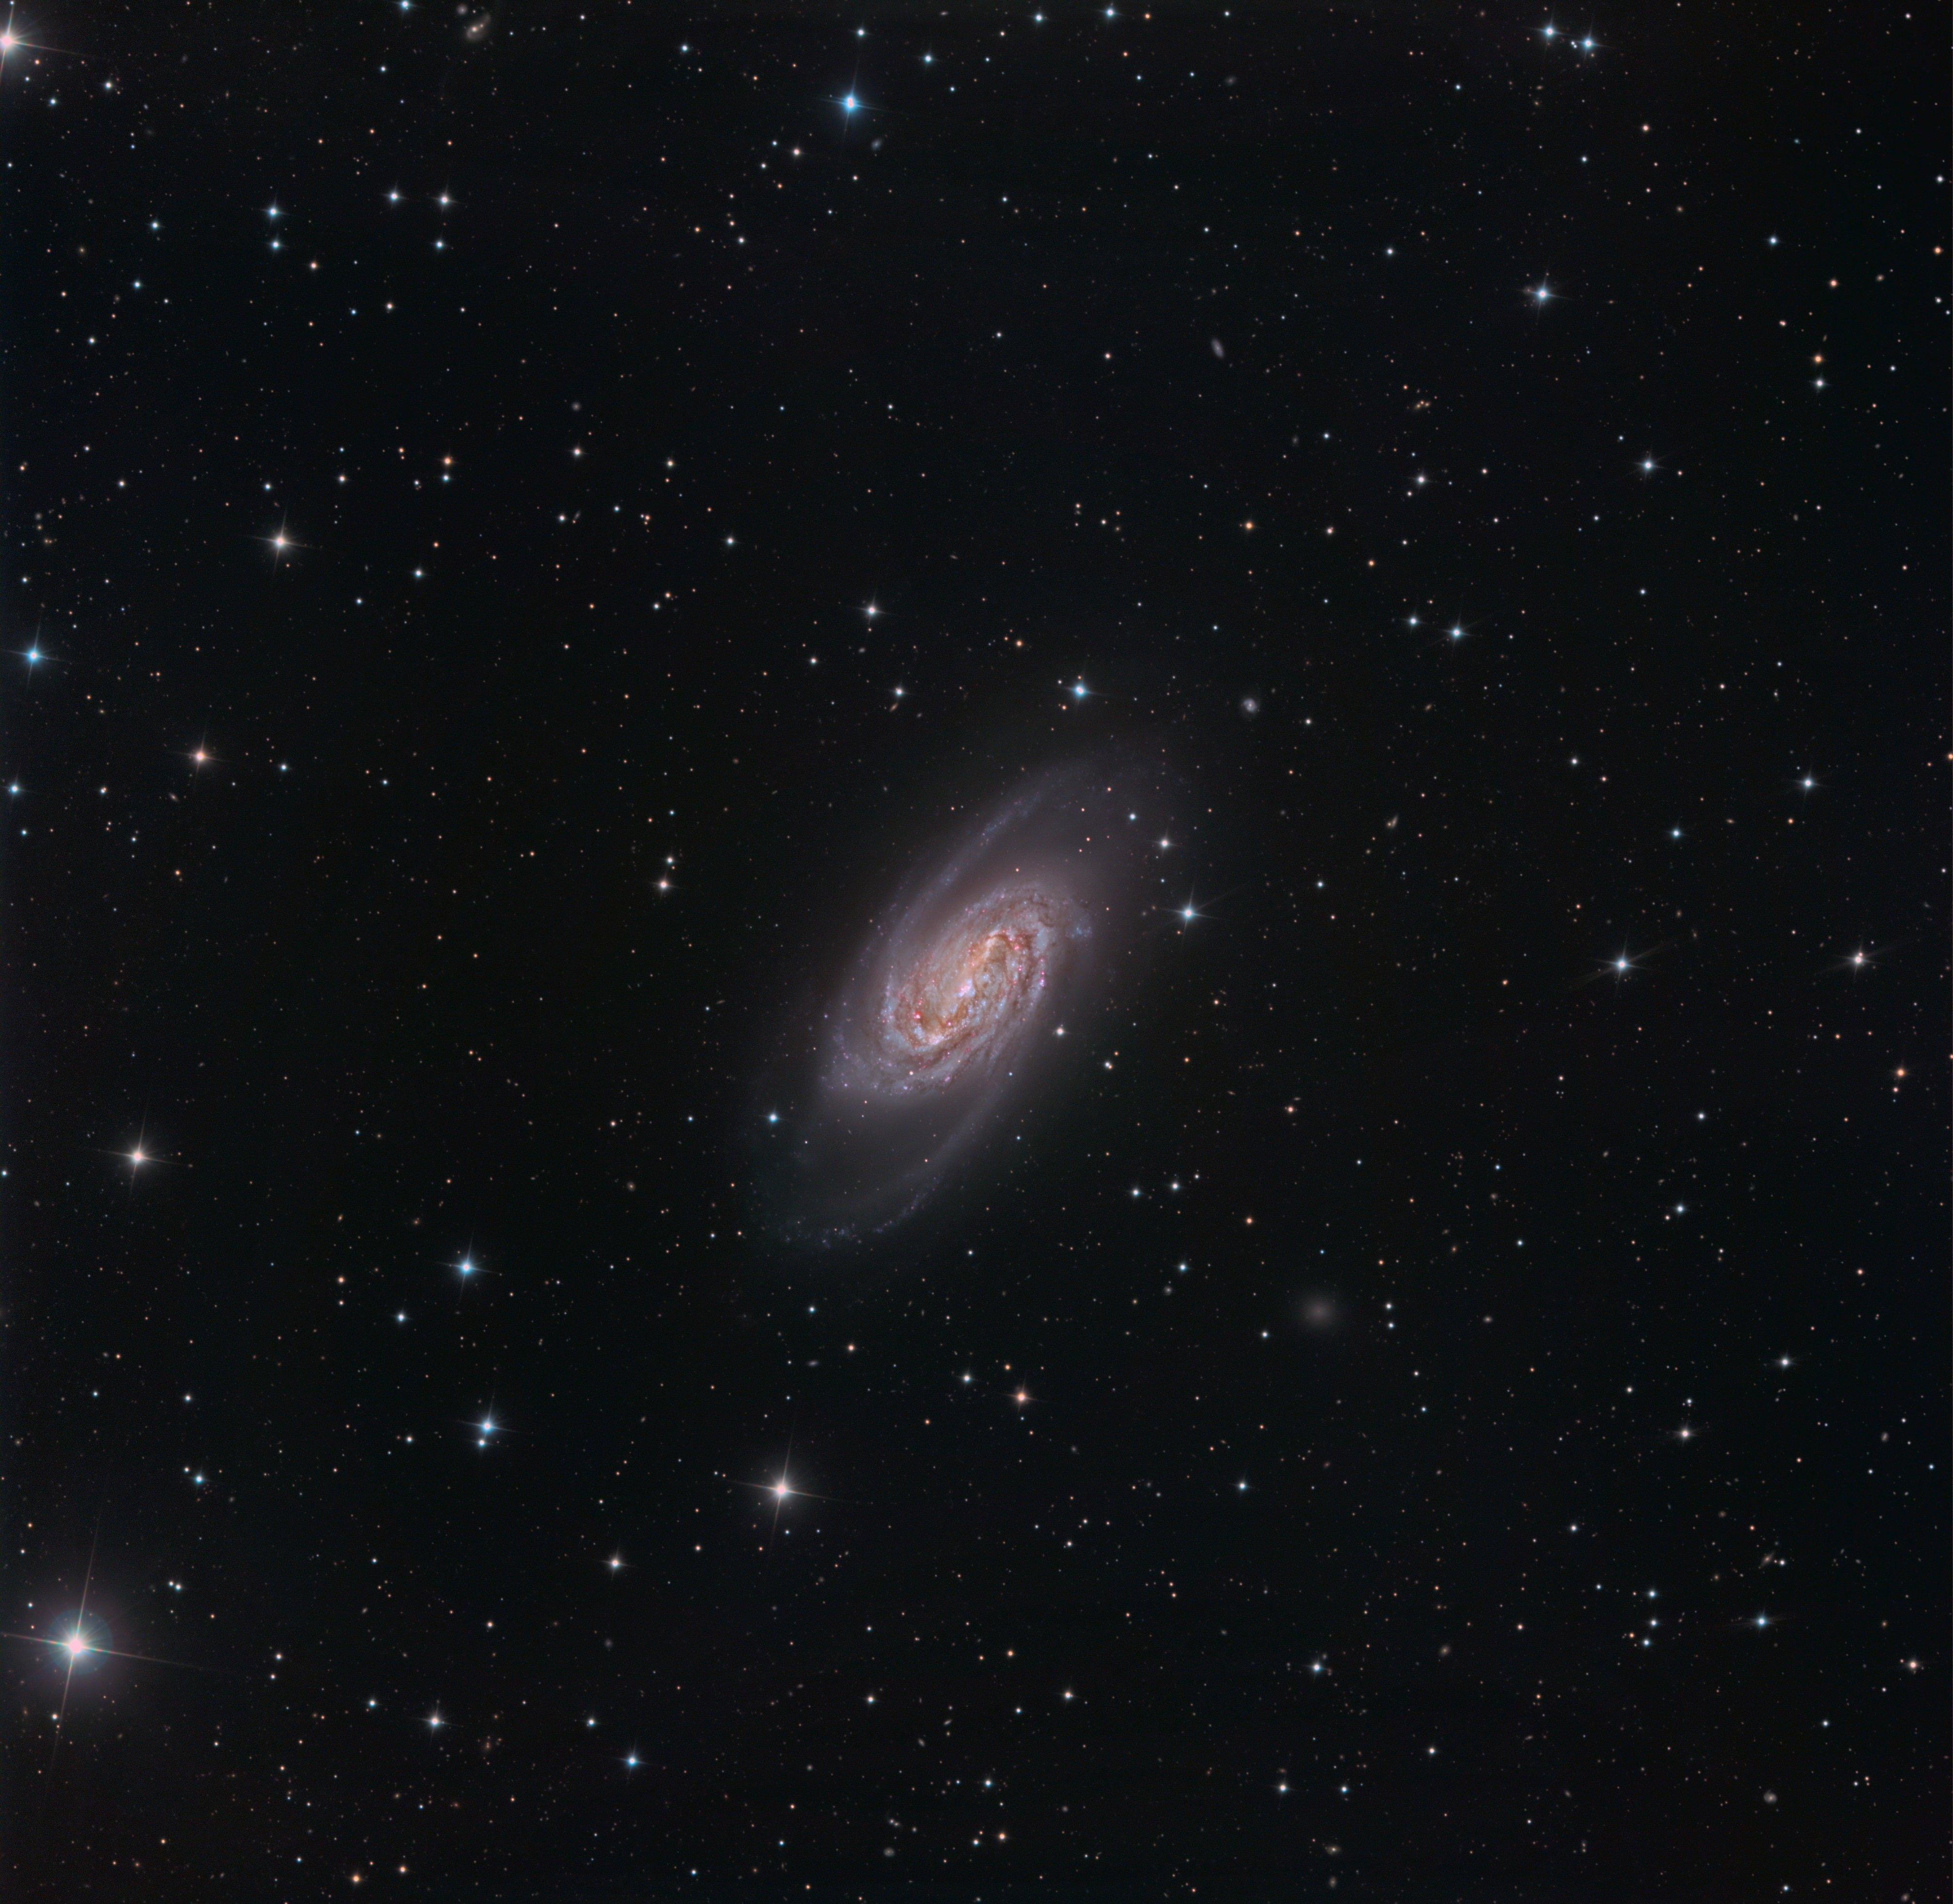 NGC2903_C2PU.JPG